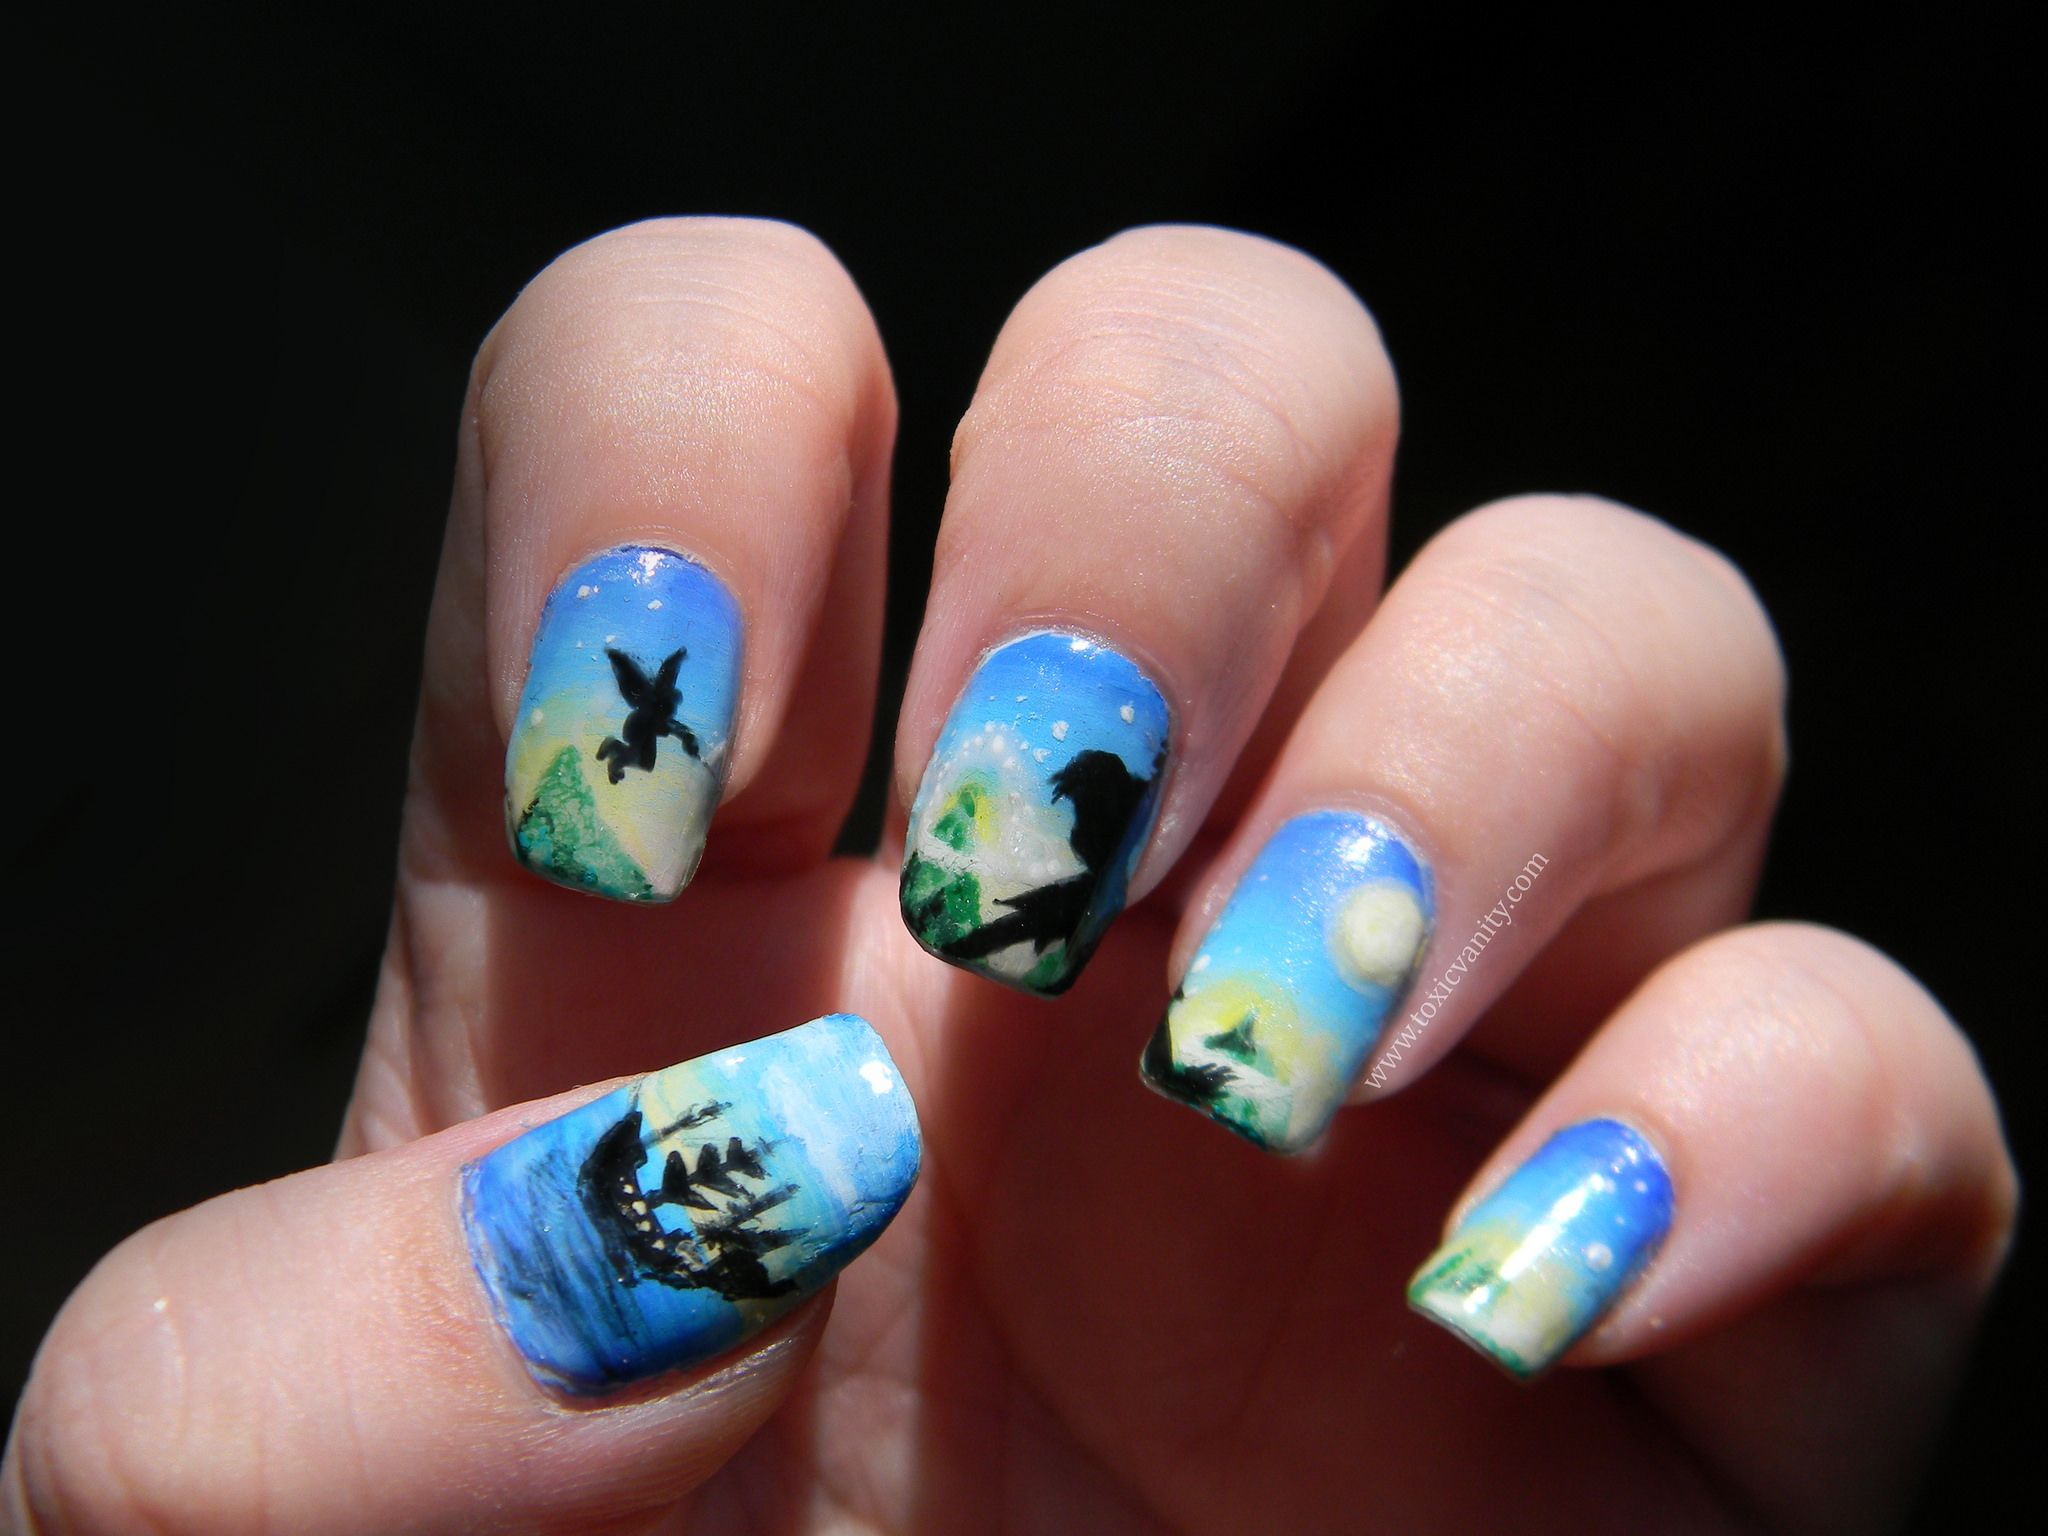 disney nail art에 대한 이미지 검색결과   Beauty   Pinterest   Disney ...